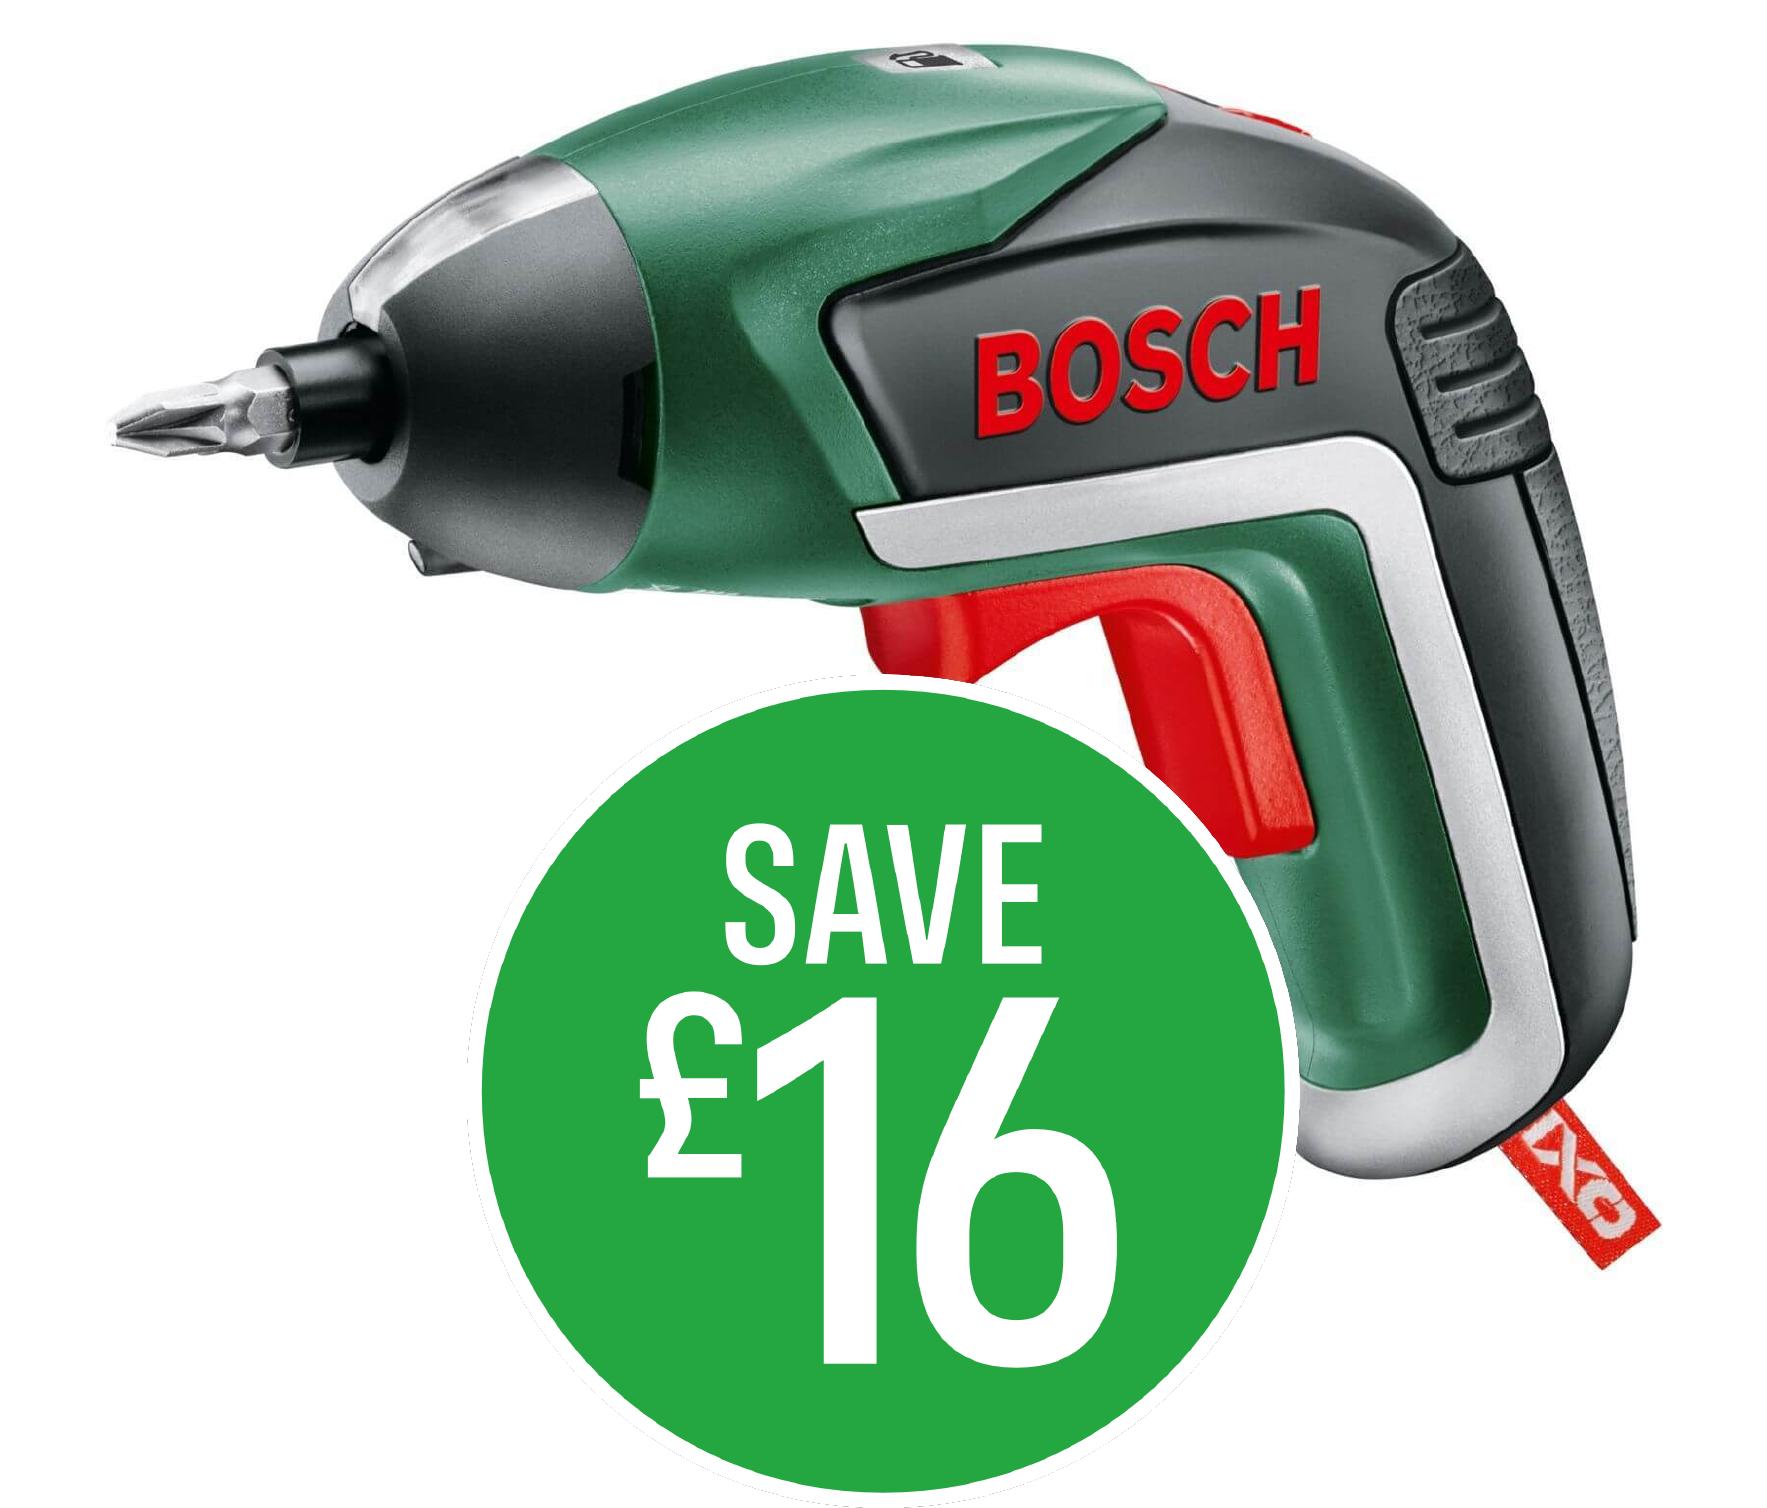 Save £16 on Bosch IXO 3.6V Screwdriver